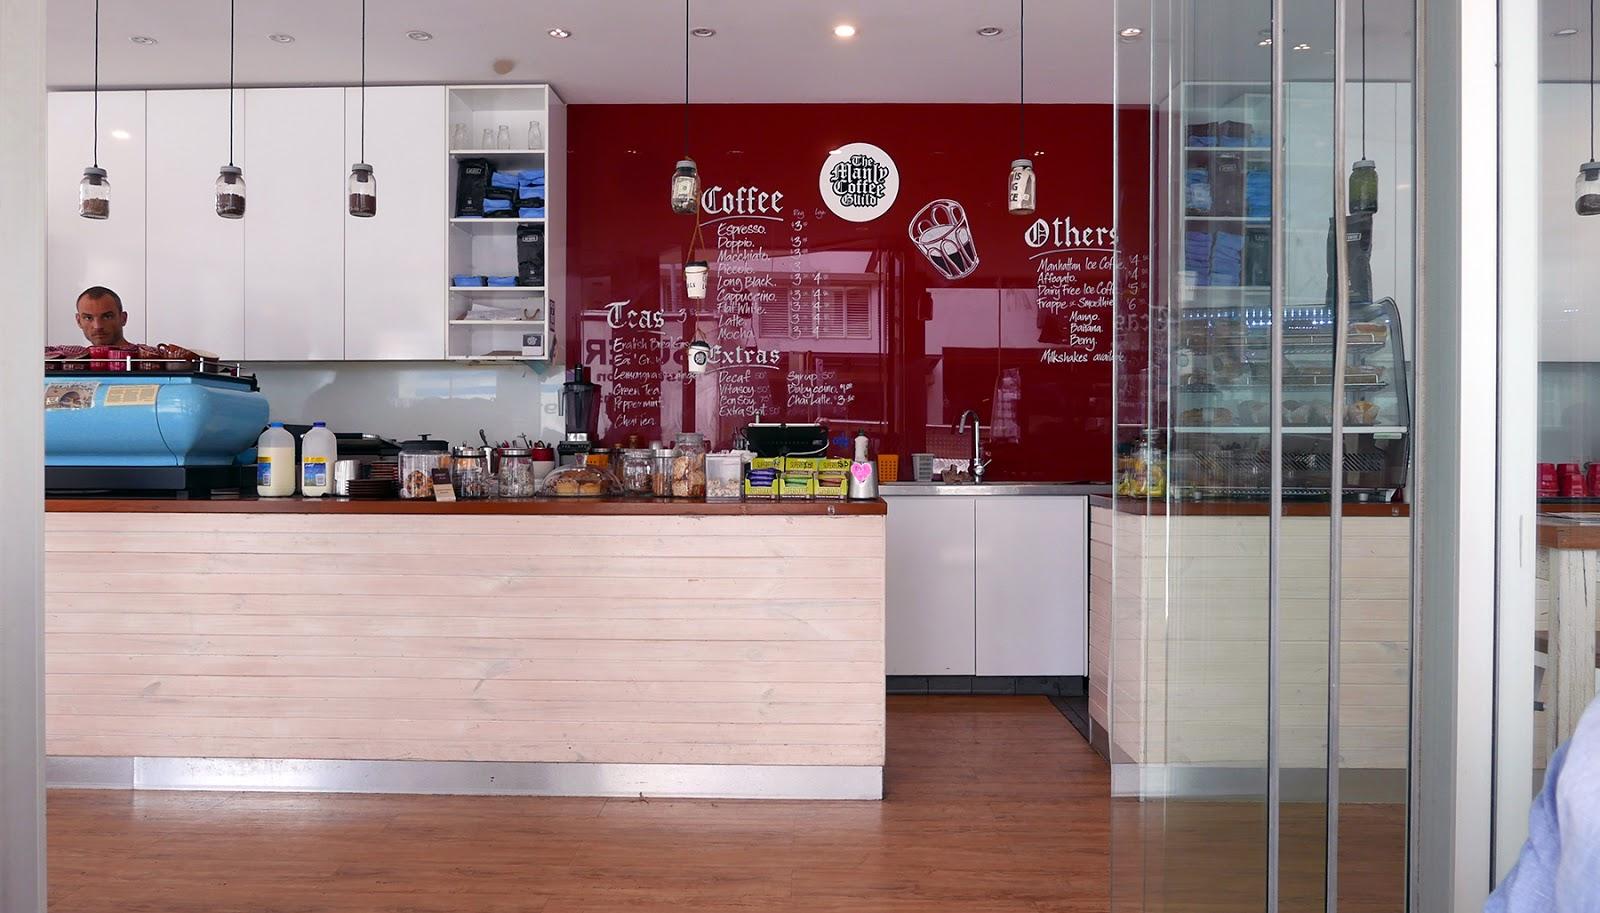 Euriental | luxury travel & style | Manly Coffee Guild, Sydney, Australia